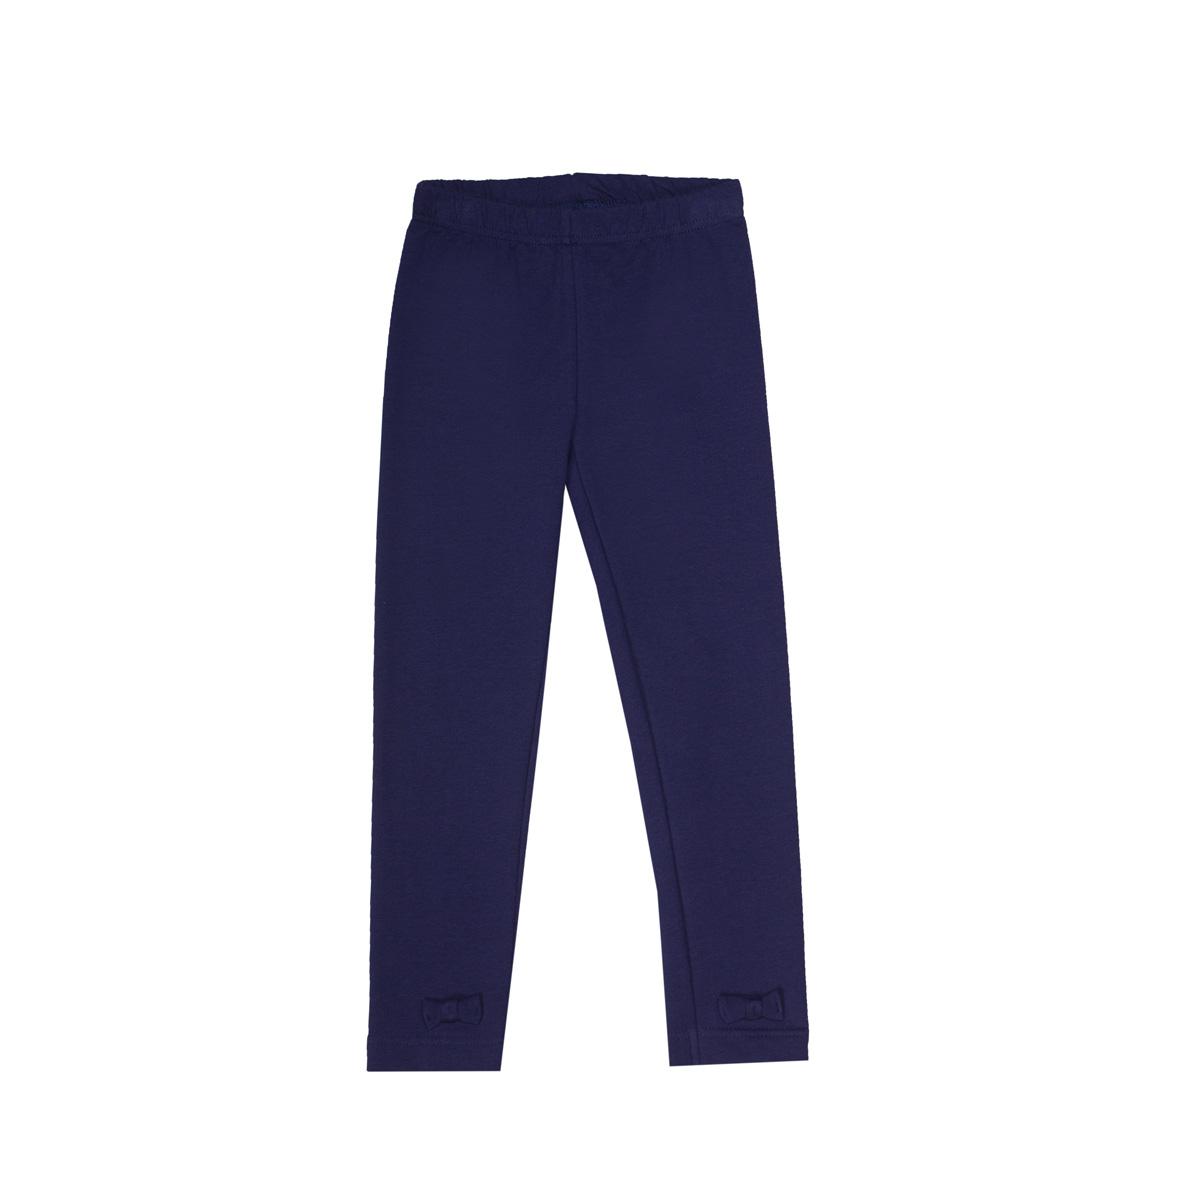 Dekliške hlače, temno modra